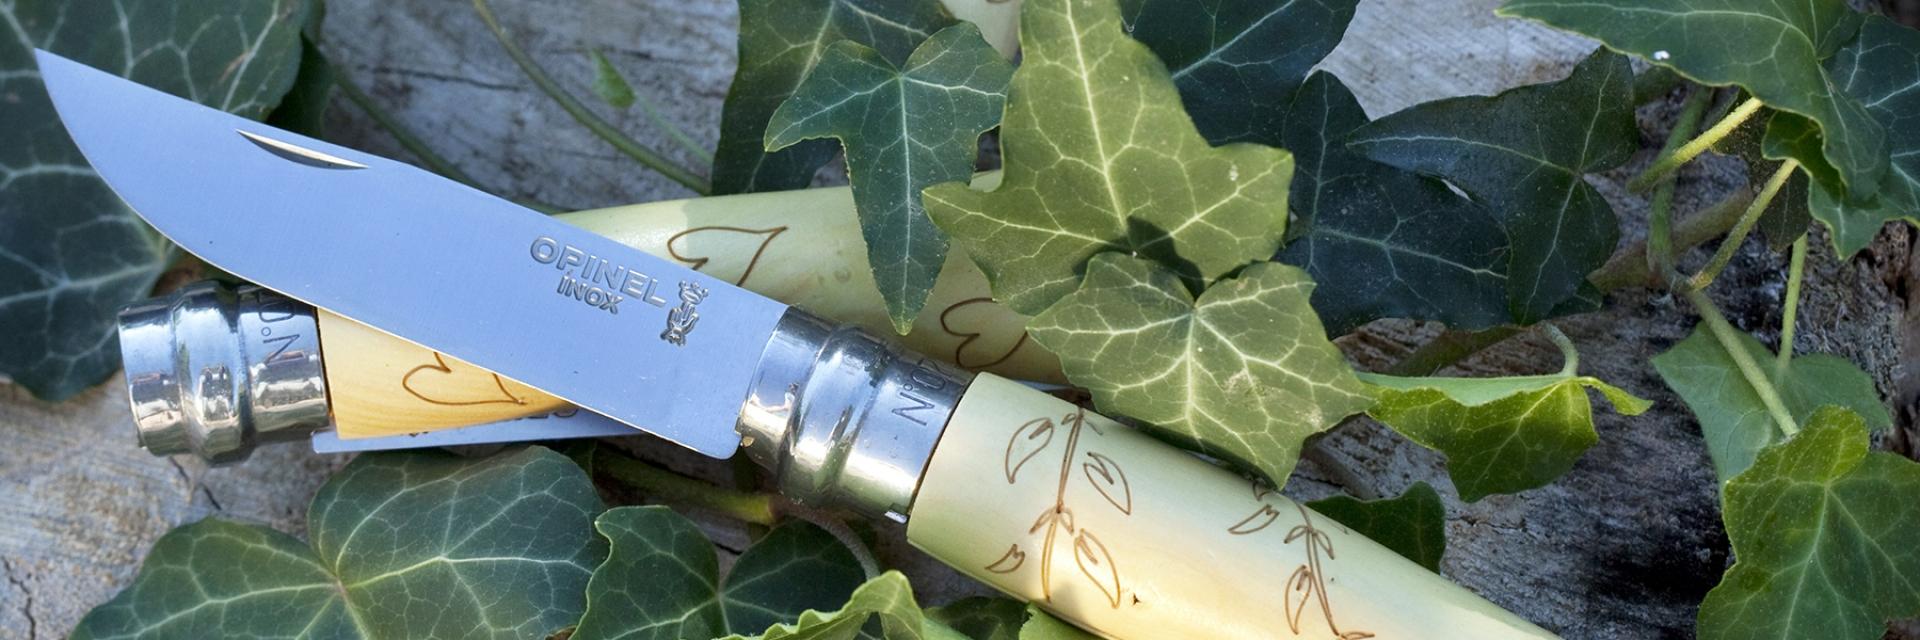 Opinel engraved handles